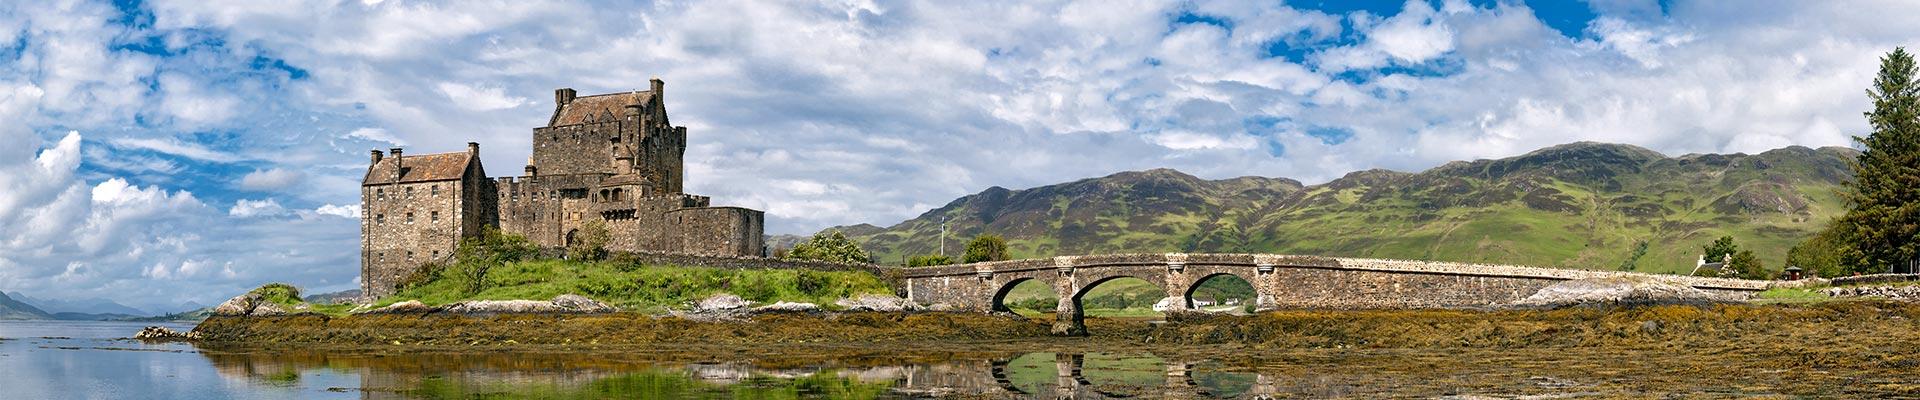 Scottish Dreams Tours - Scottish Travel Guide